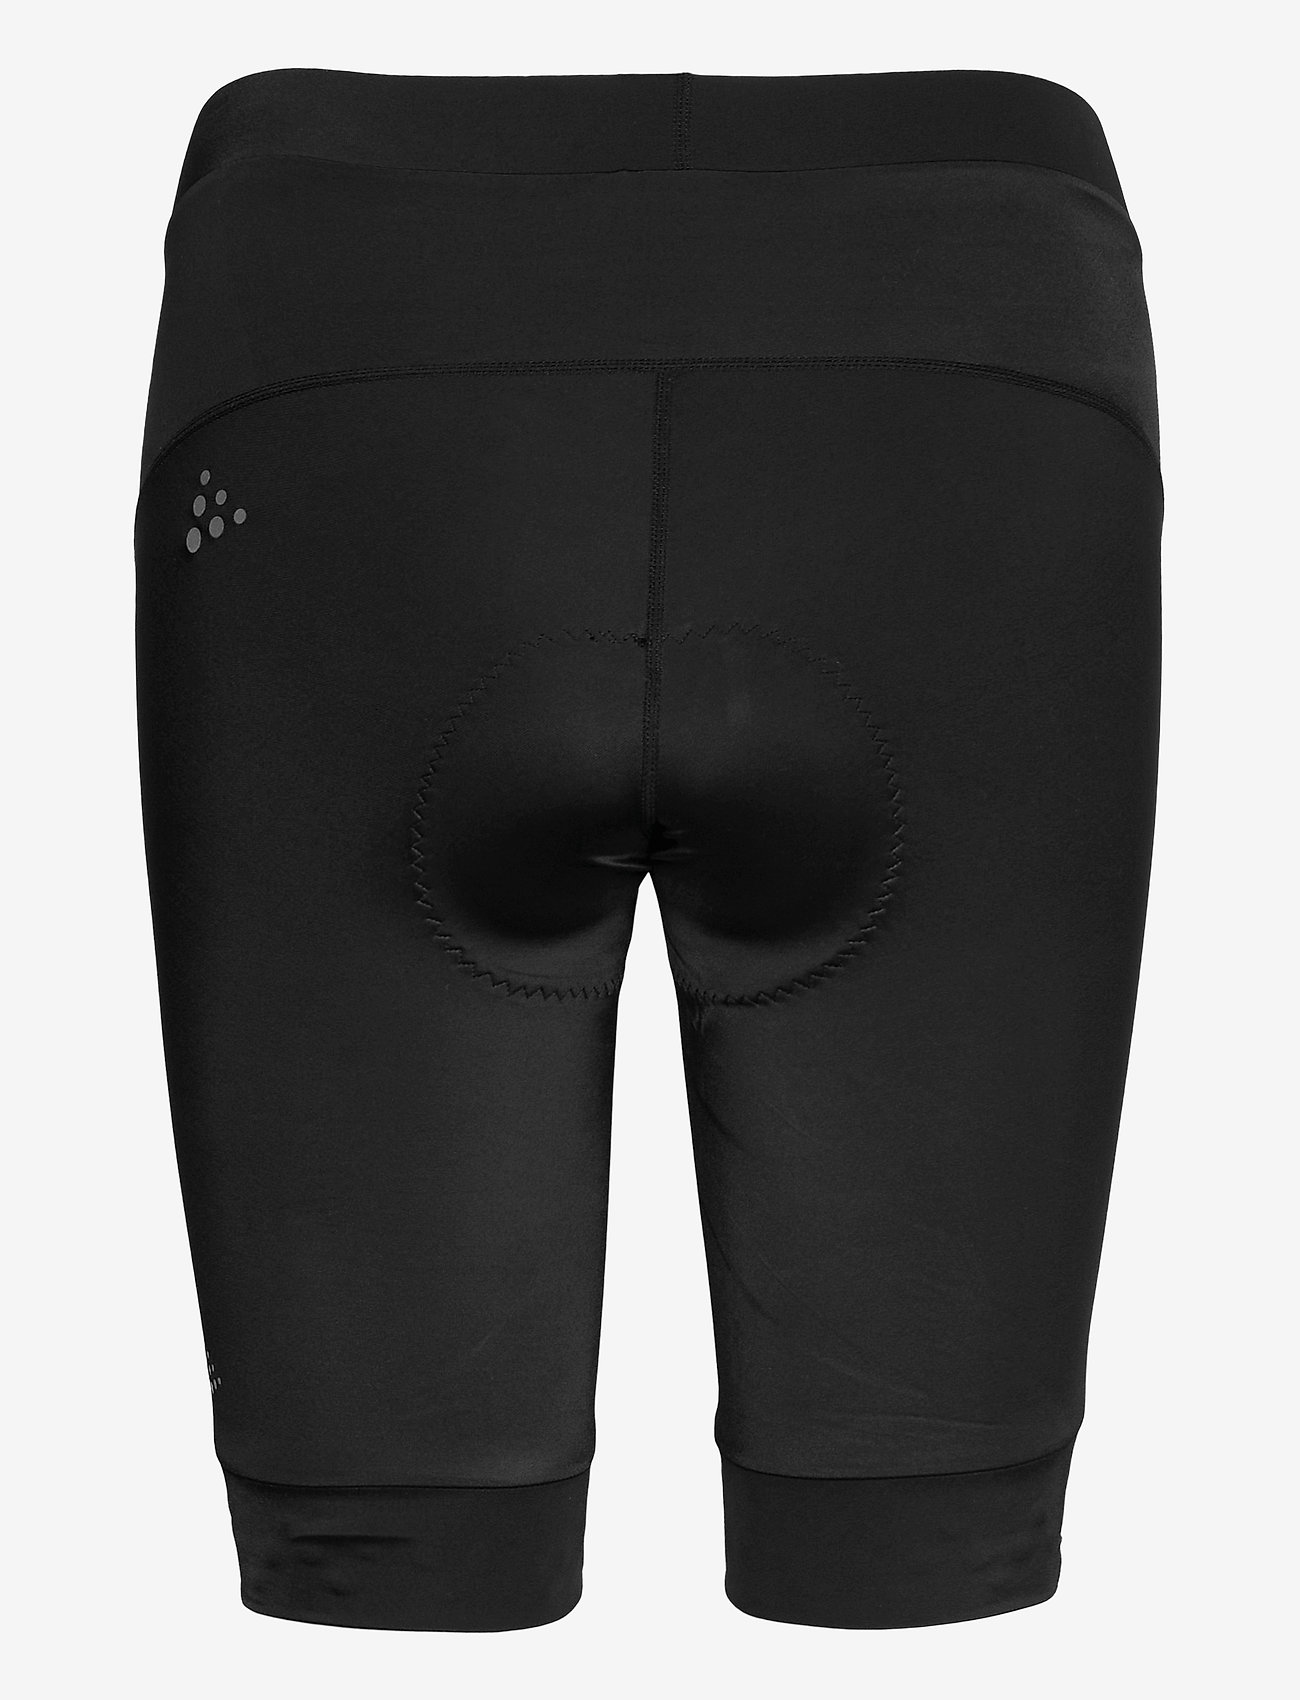 Craft - Core Endur Shorts W - wielrenshorts & -leggings - black-black - 1